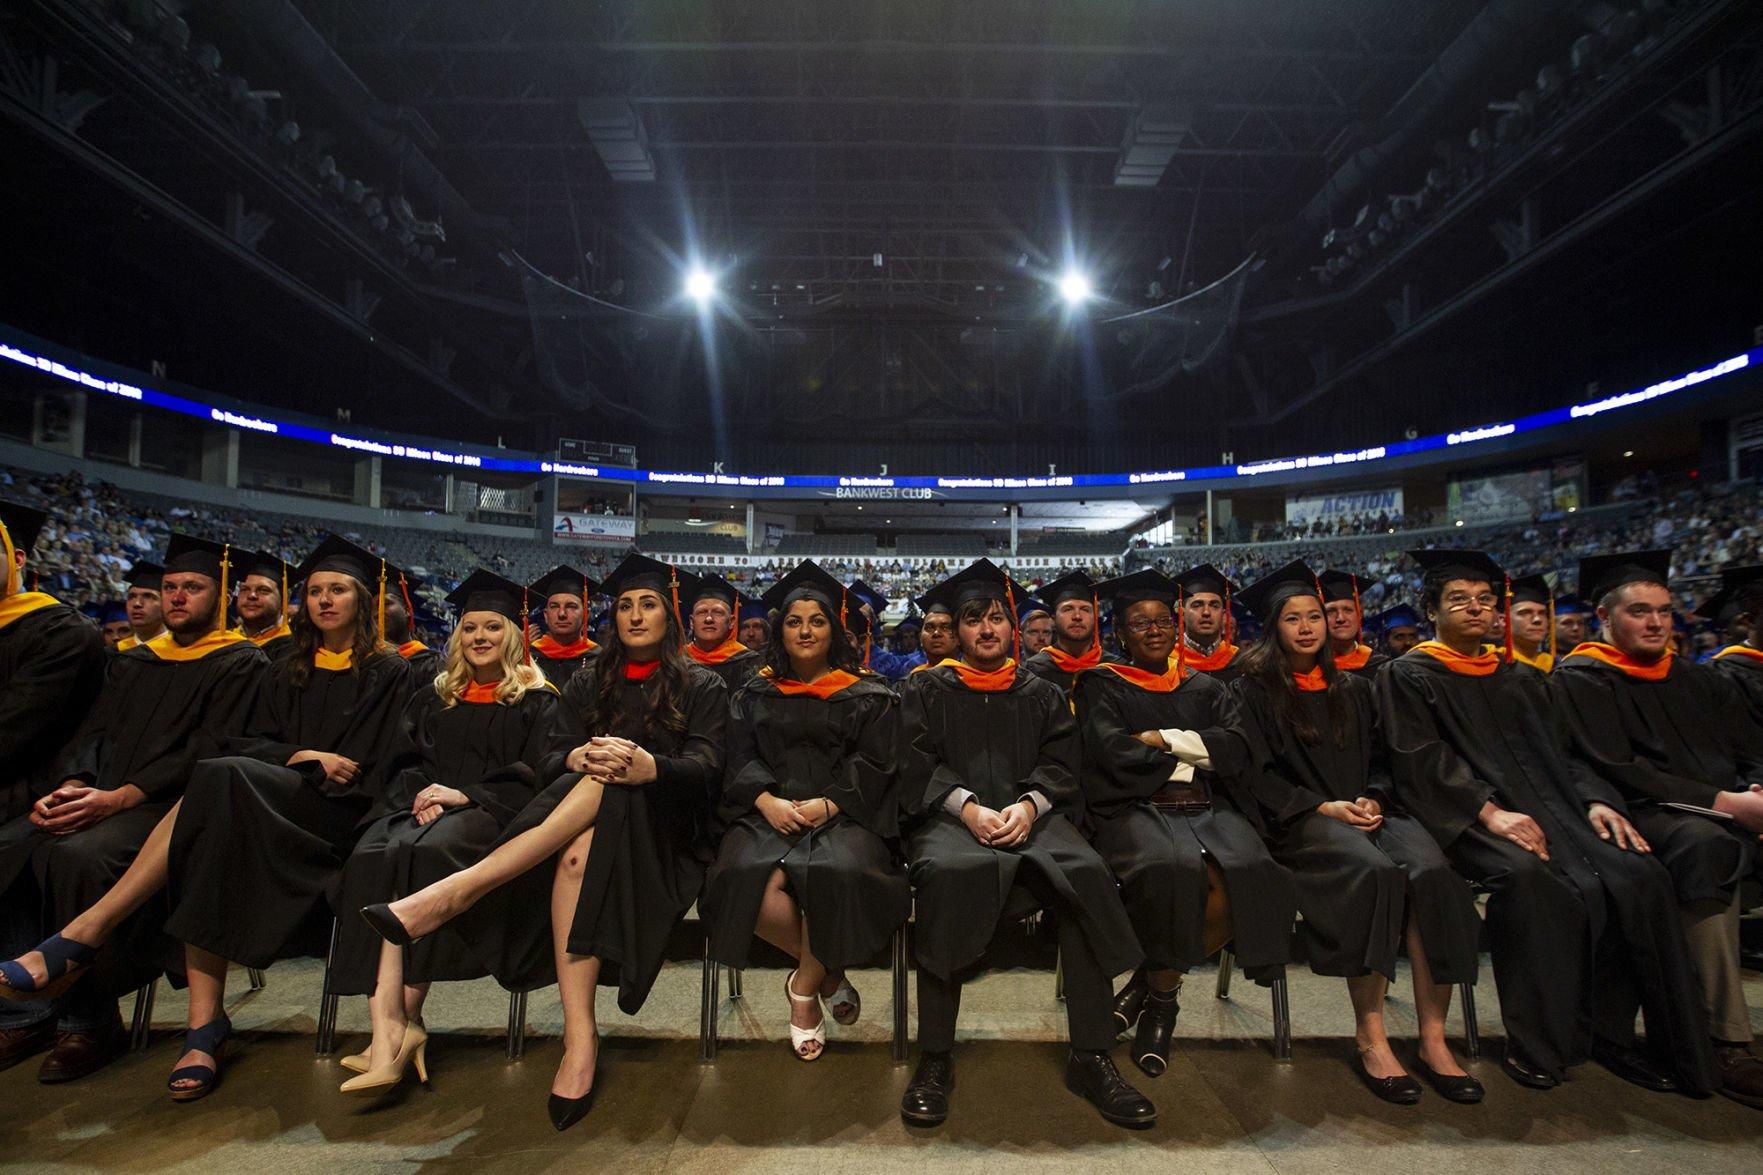 Mines graduate pilots mentoring program for female